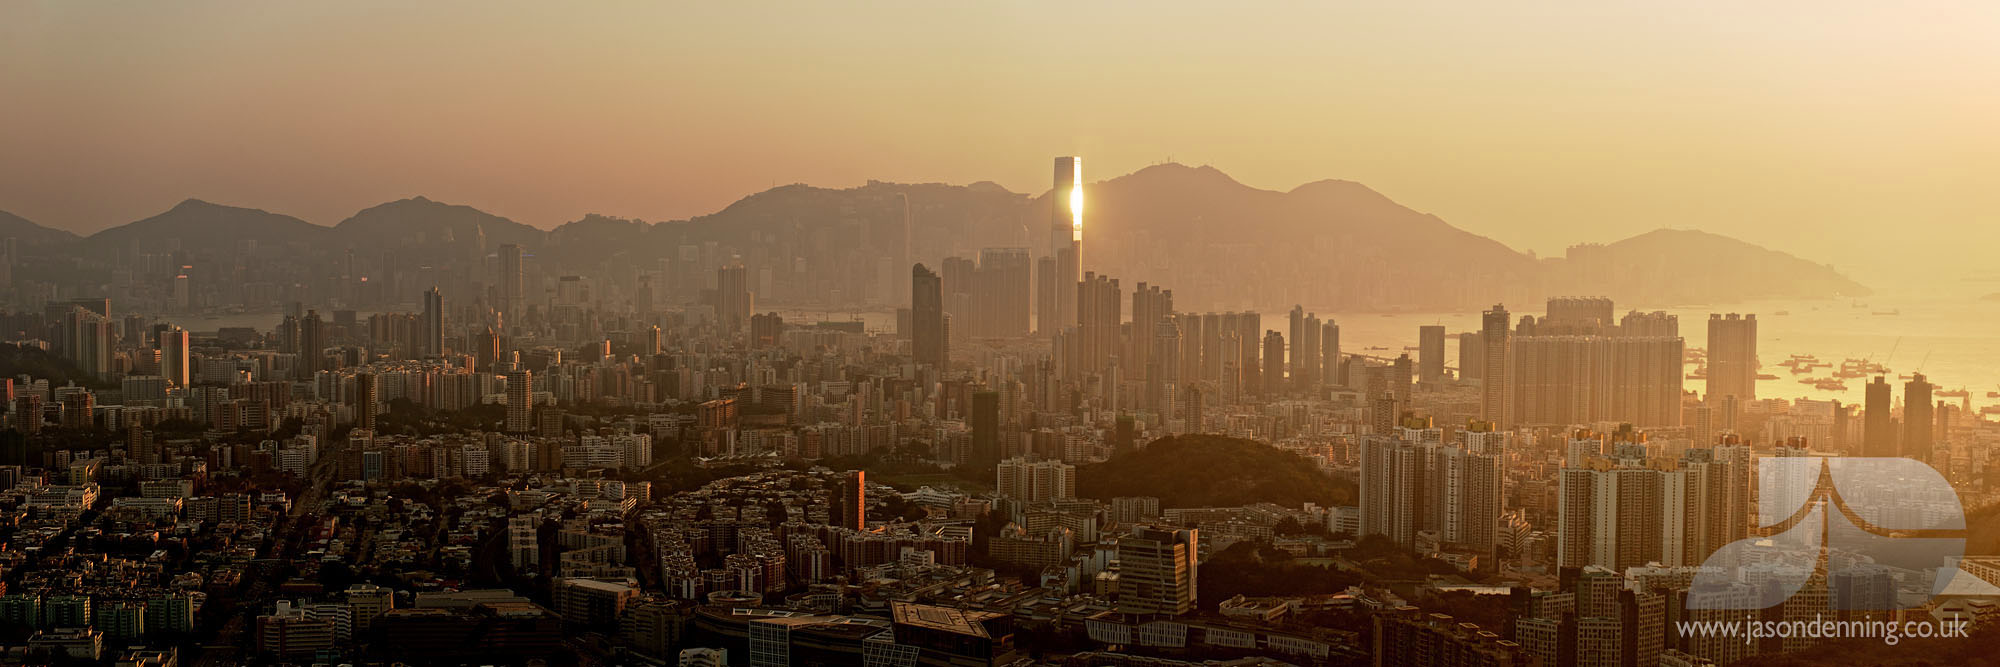 Hong Kong Part 4 (Lets pretend Part 3 never happened)